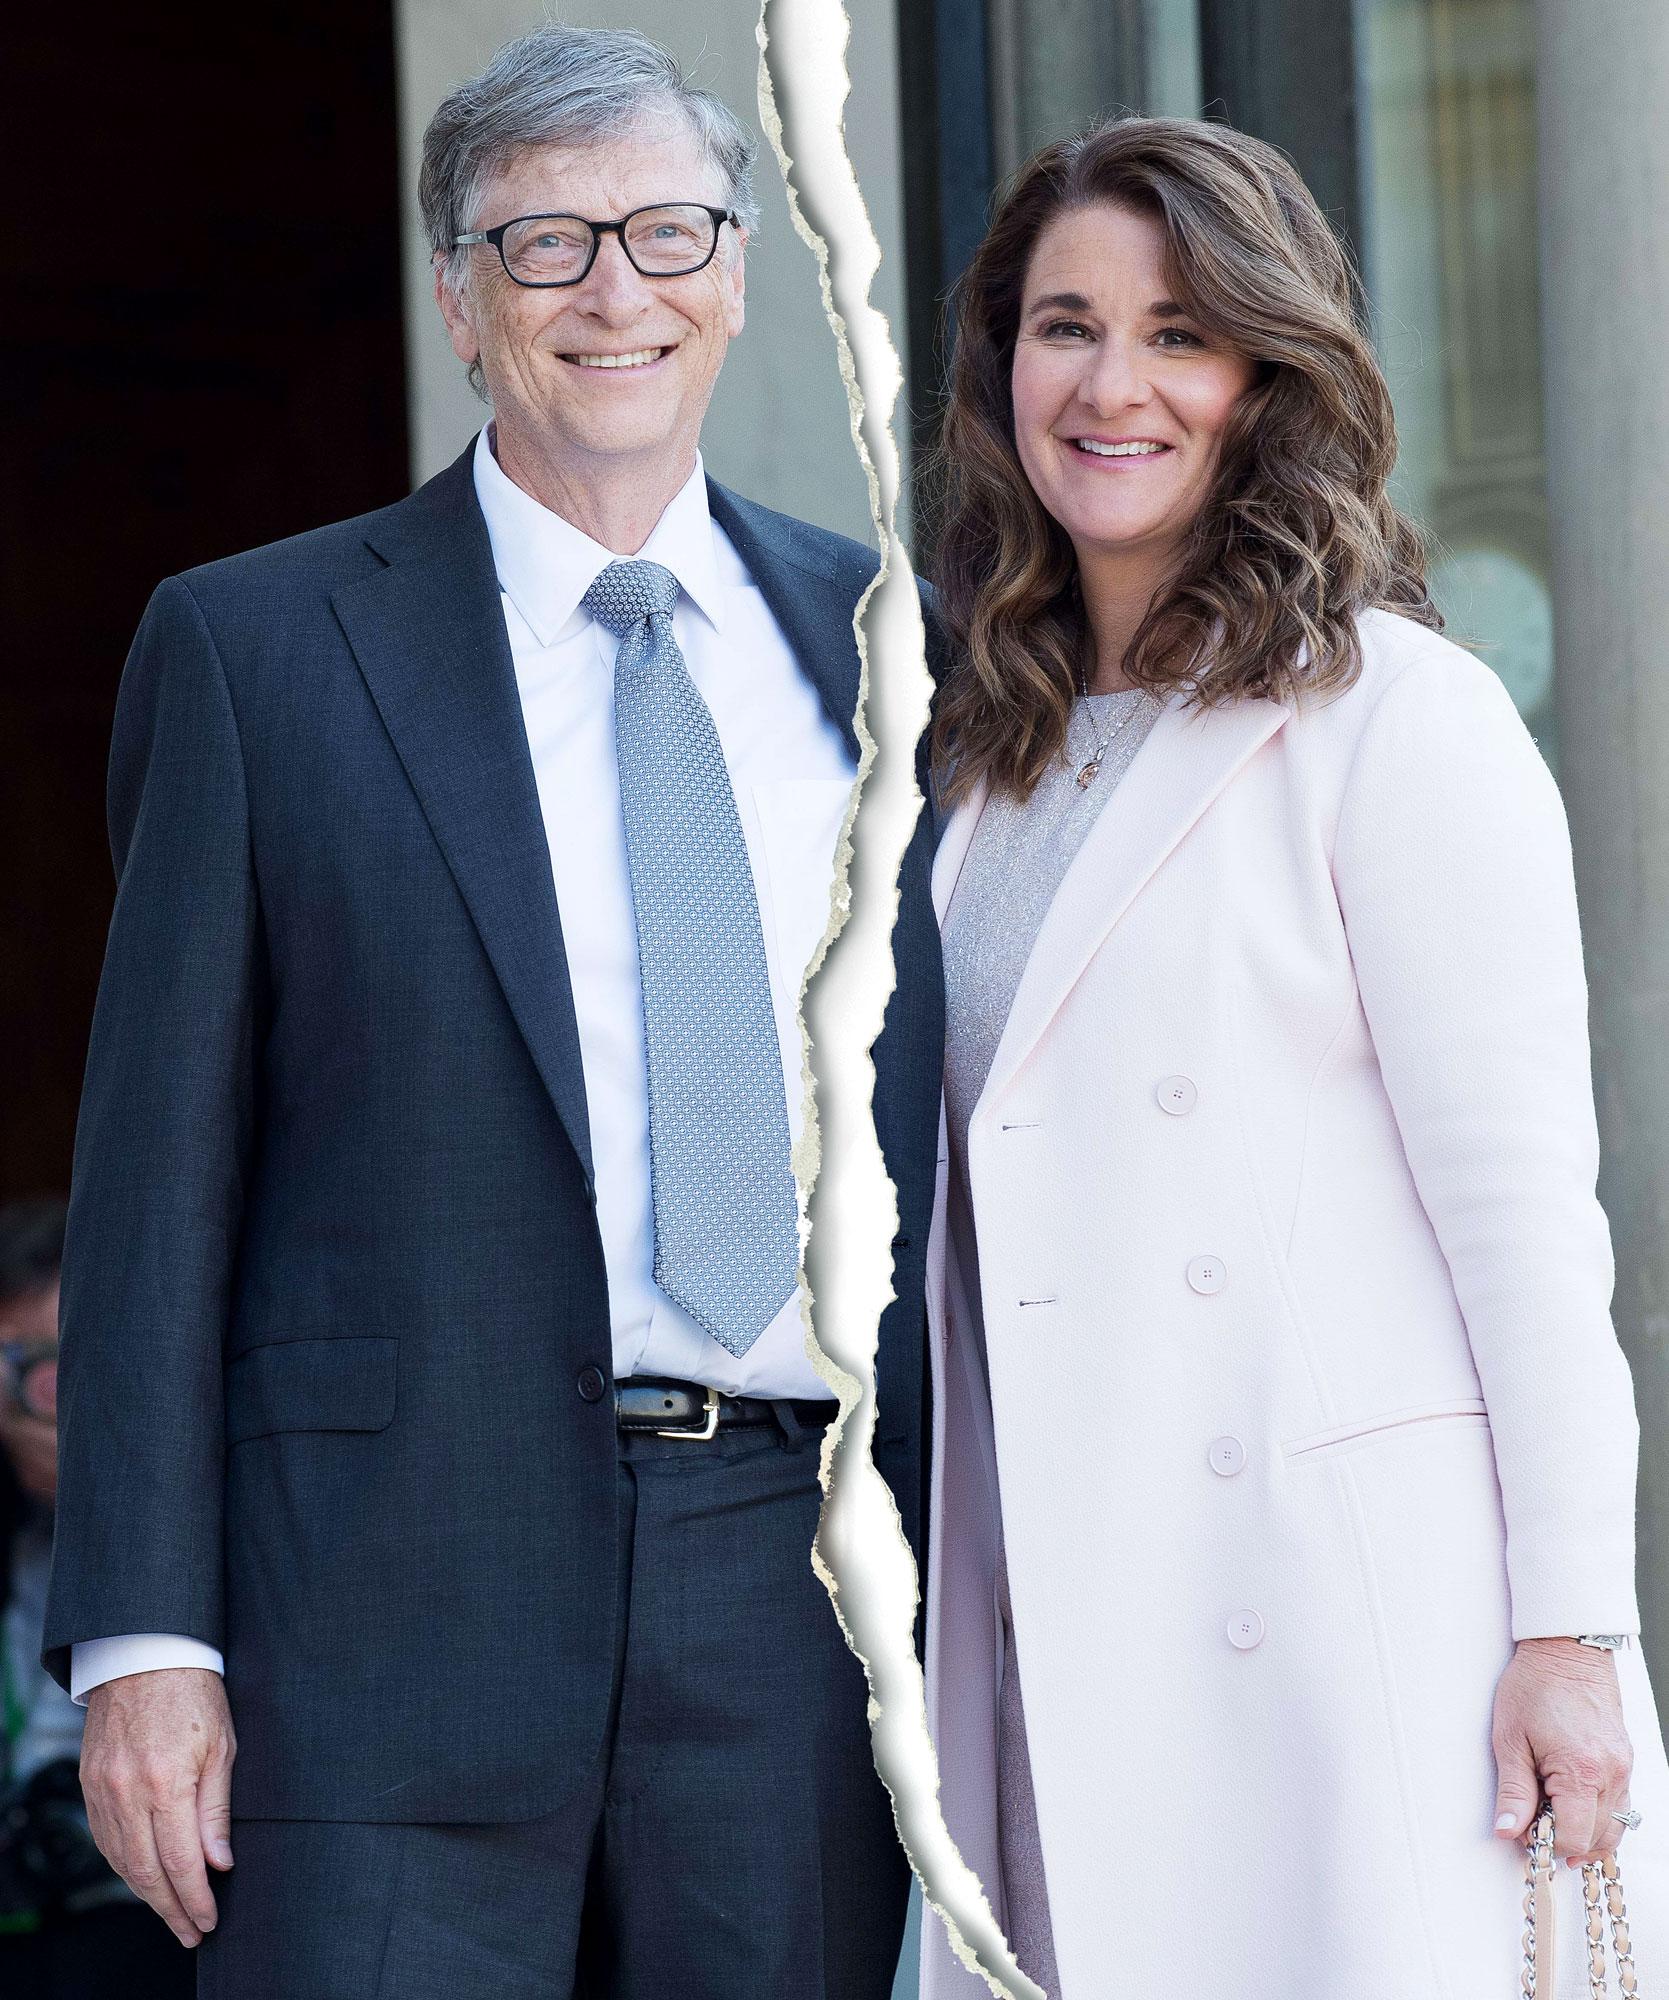 Bill Gates, Melinda Gates Split After 27 Years of Marriage